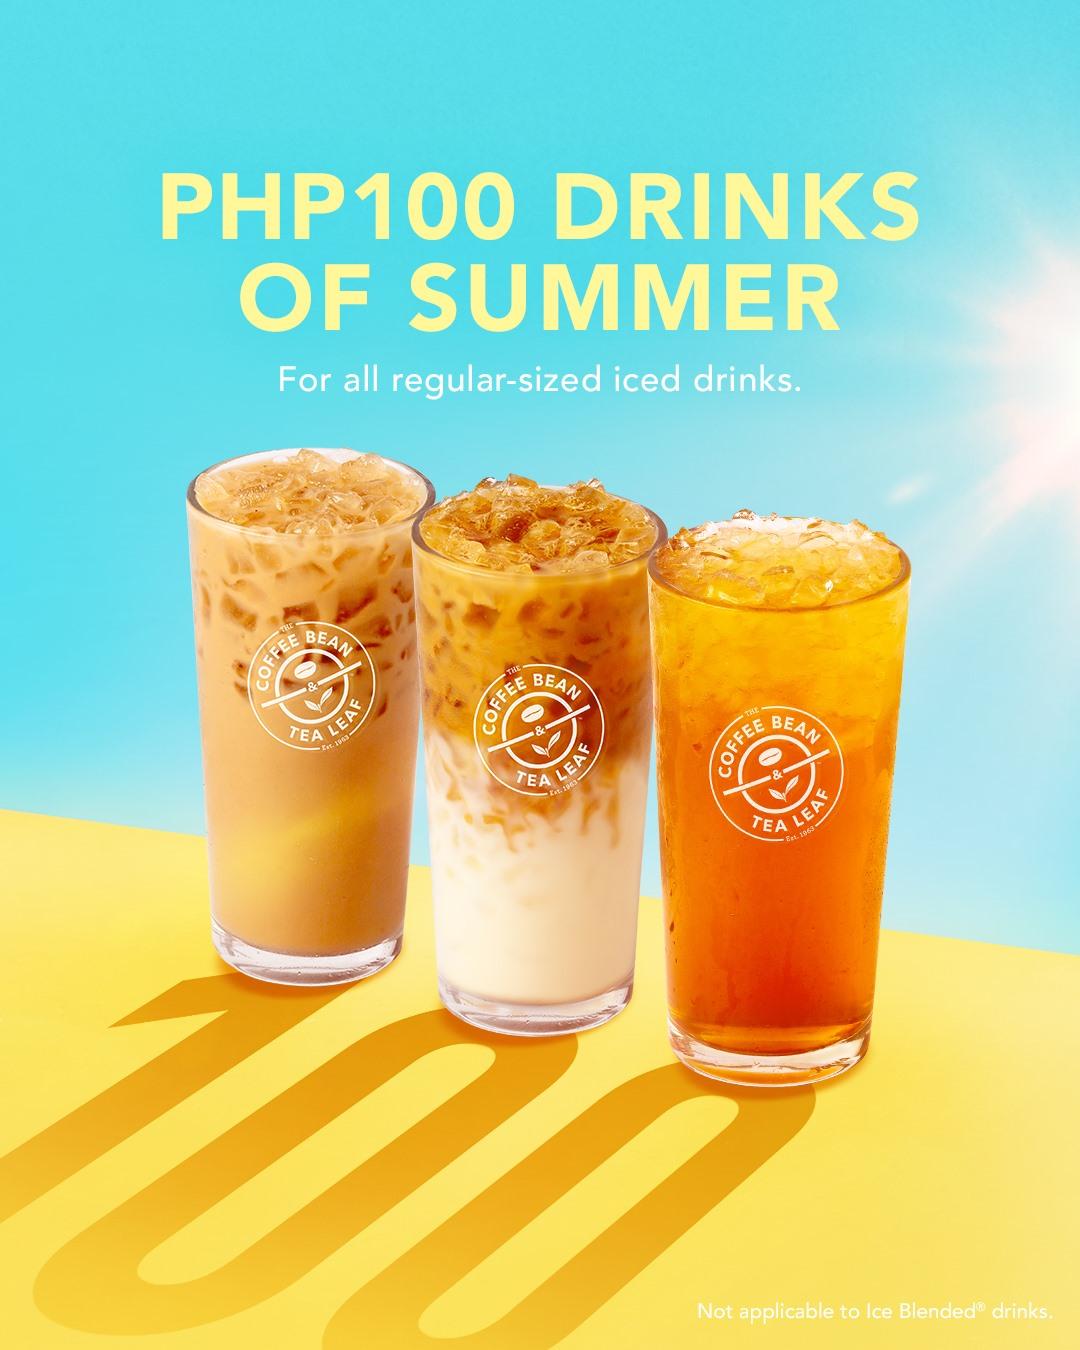 Coffee Bean & Tea Leaf P100 Summer Drinks Promo